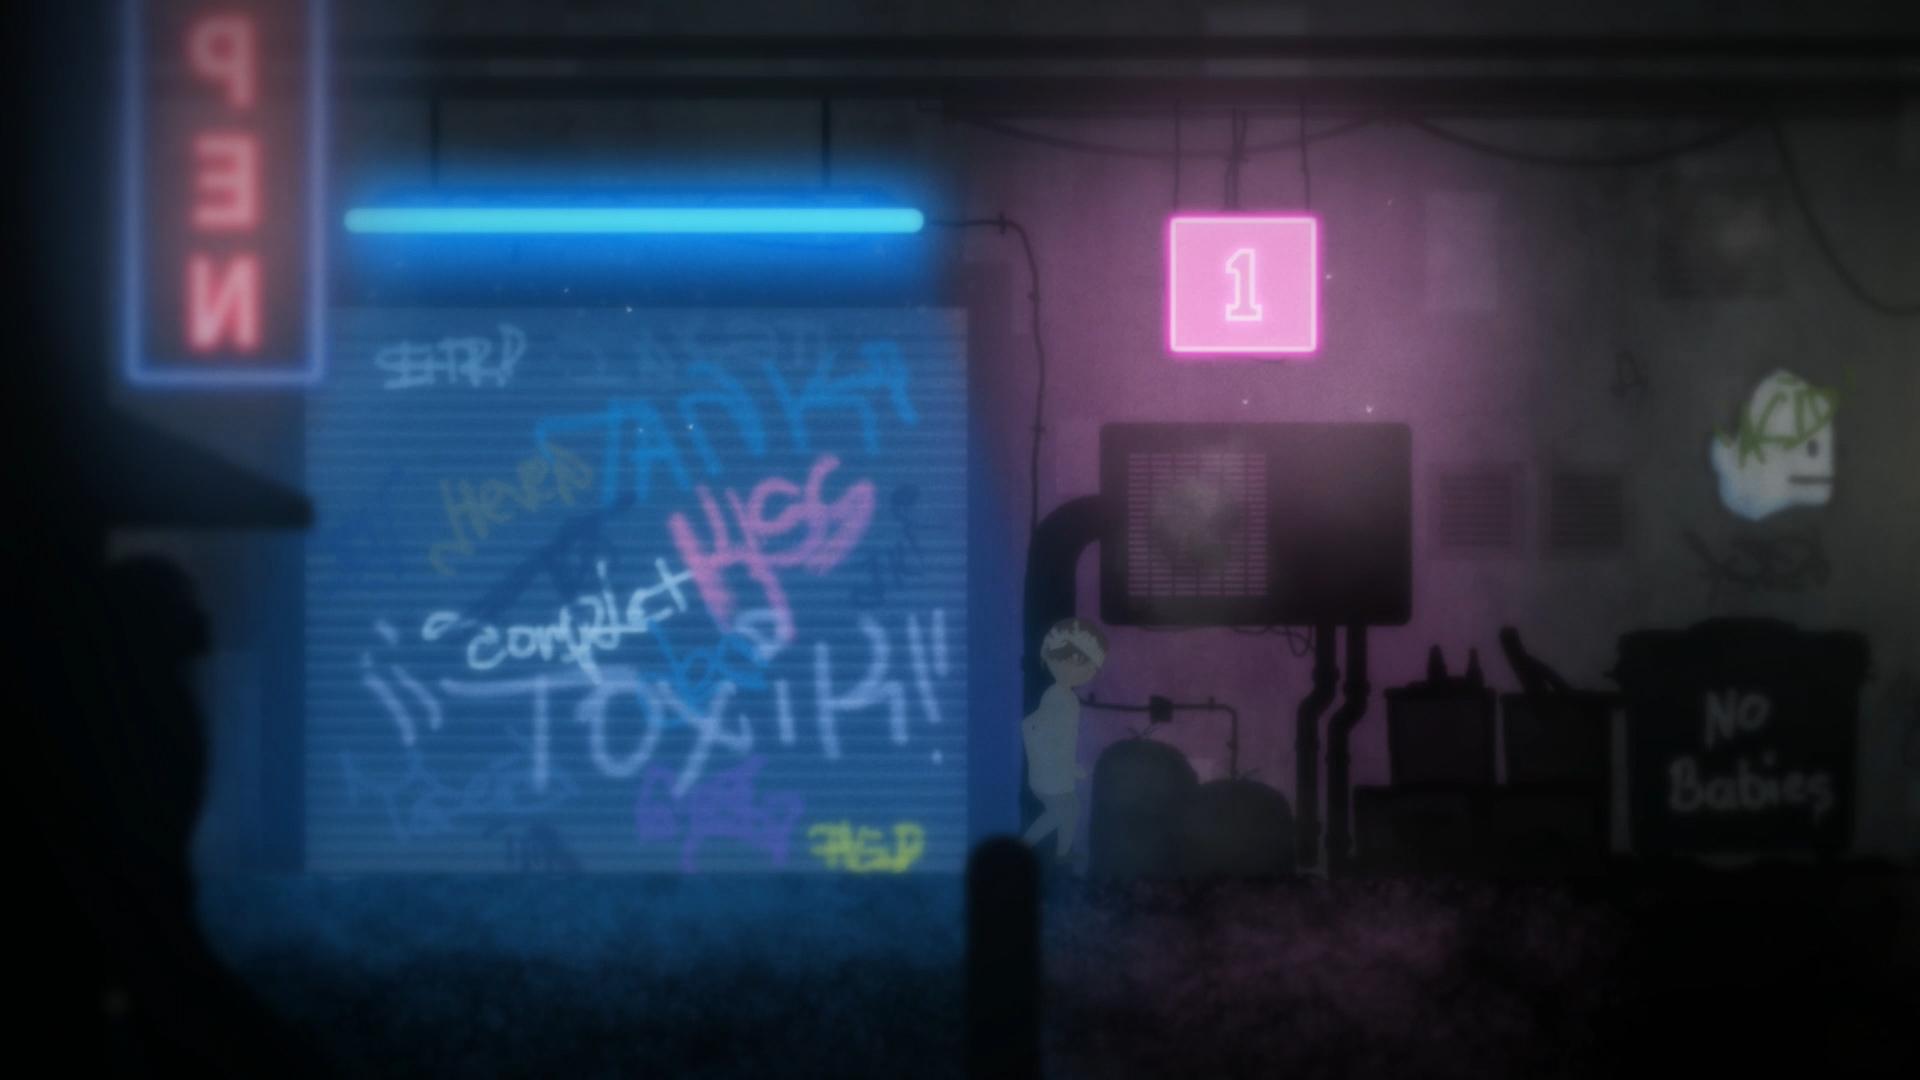 INSANE - Cyberpunk alley screenshots